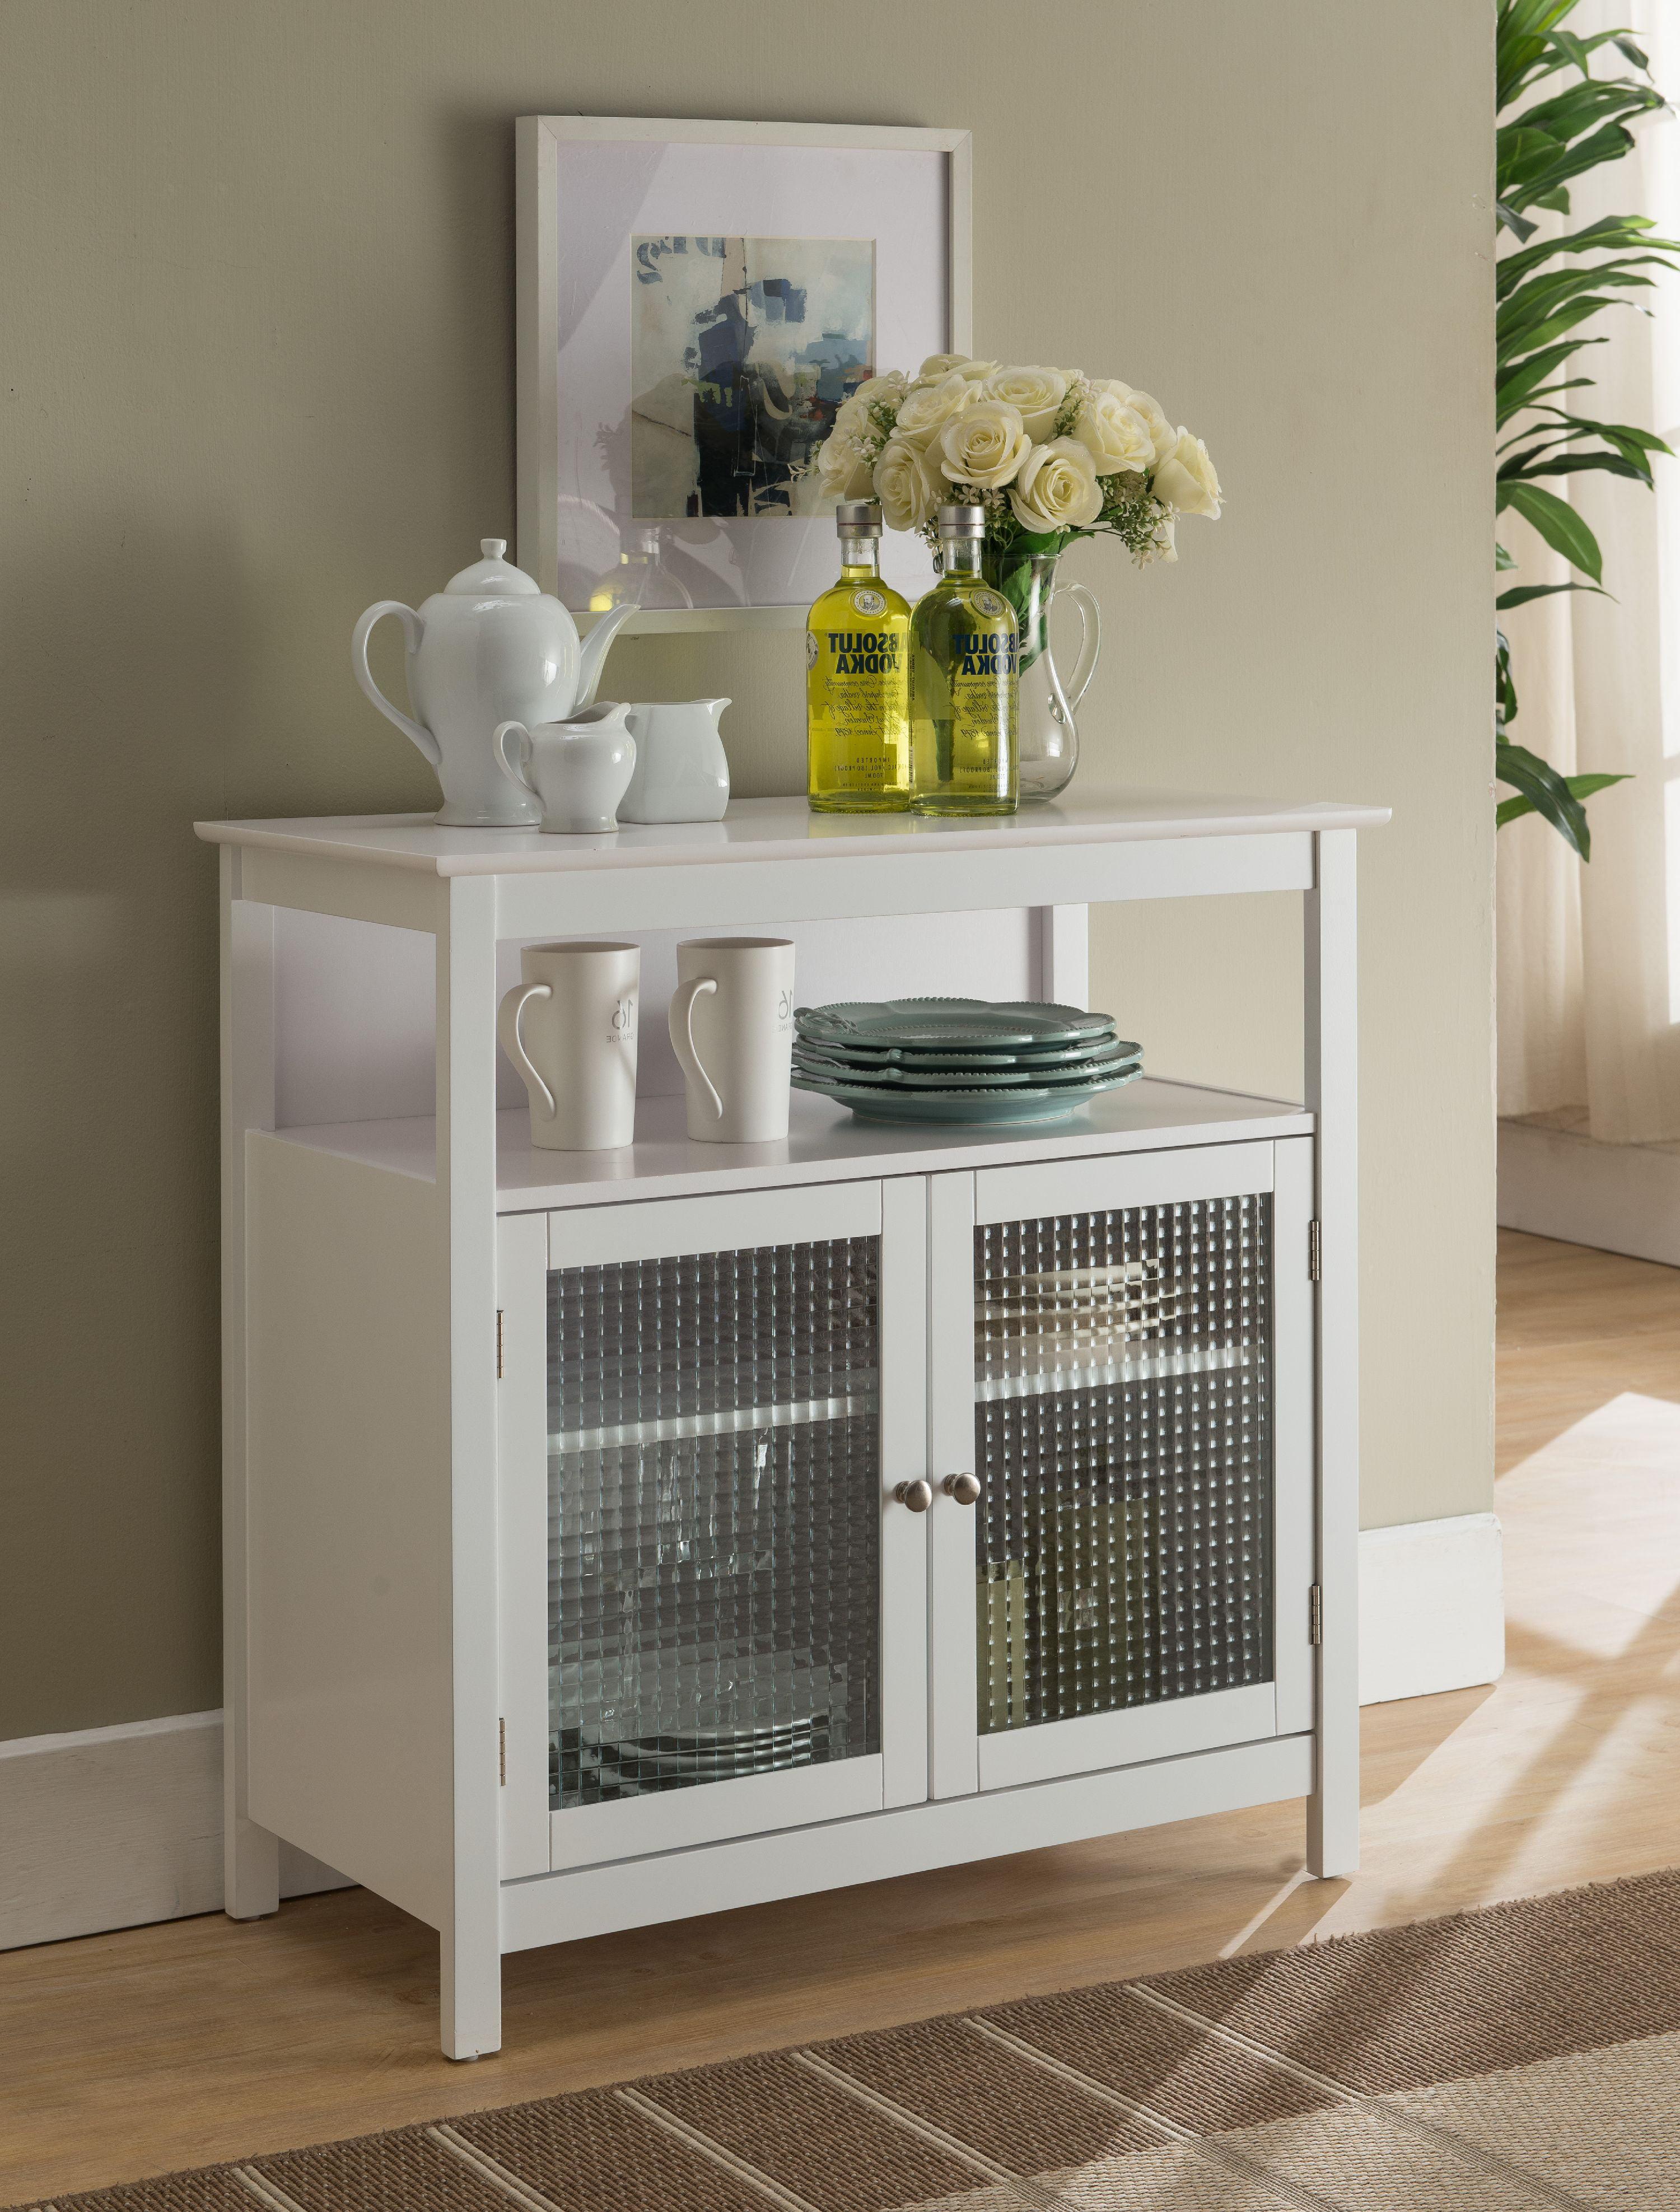 White Wood Contemporary Kitchen Storage Display Buffet Cabinet ...